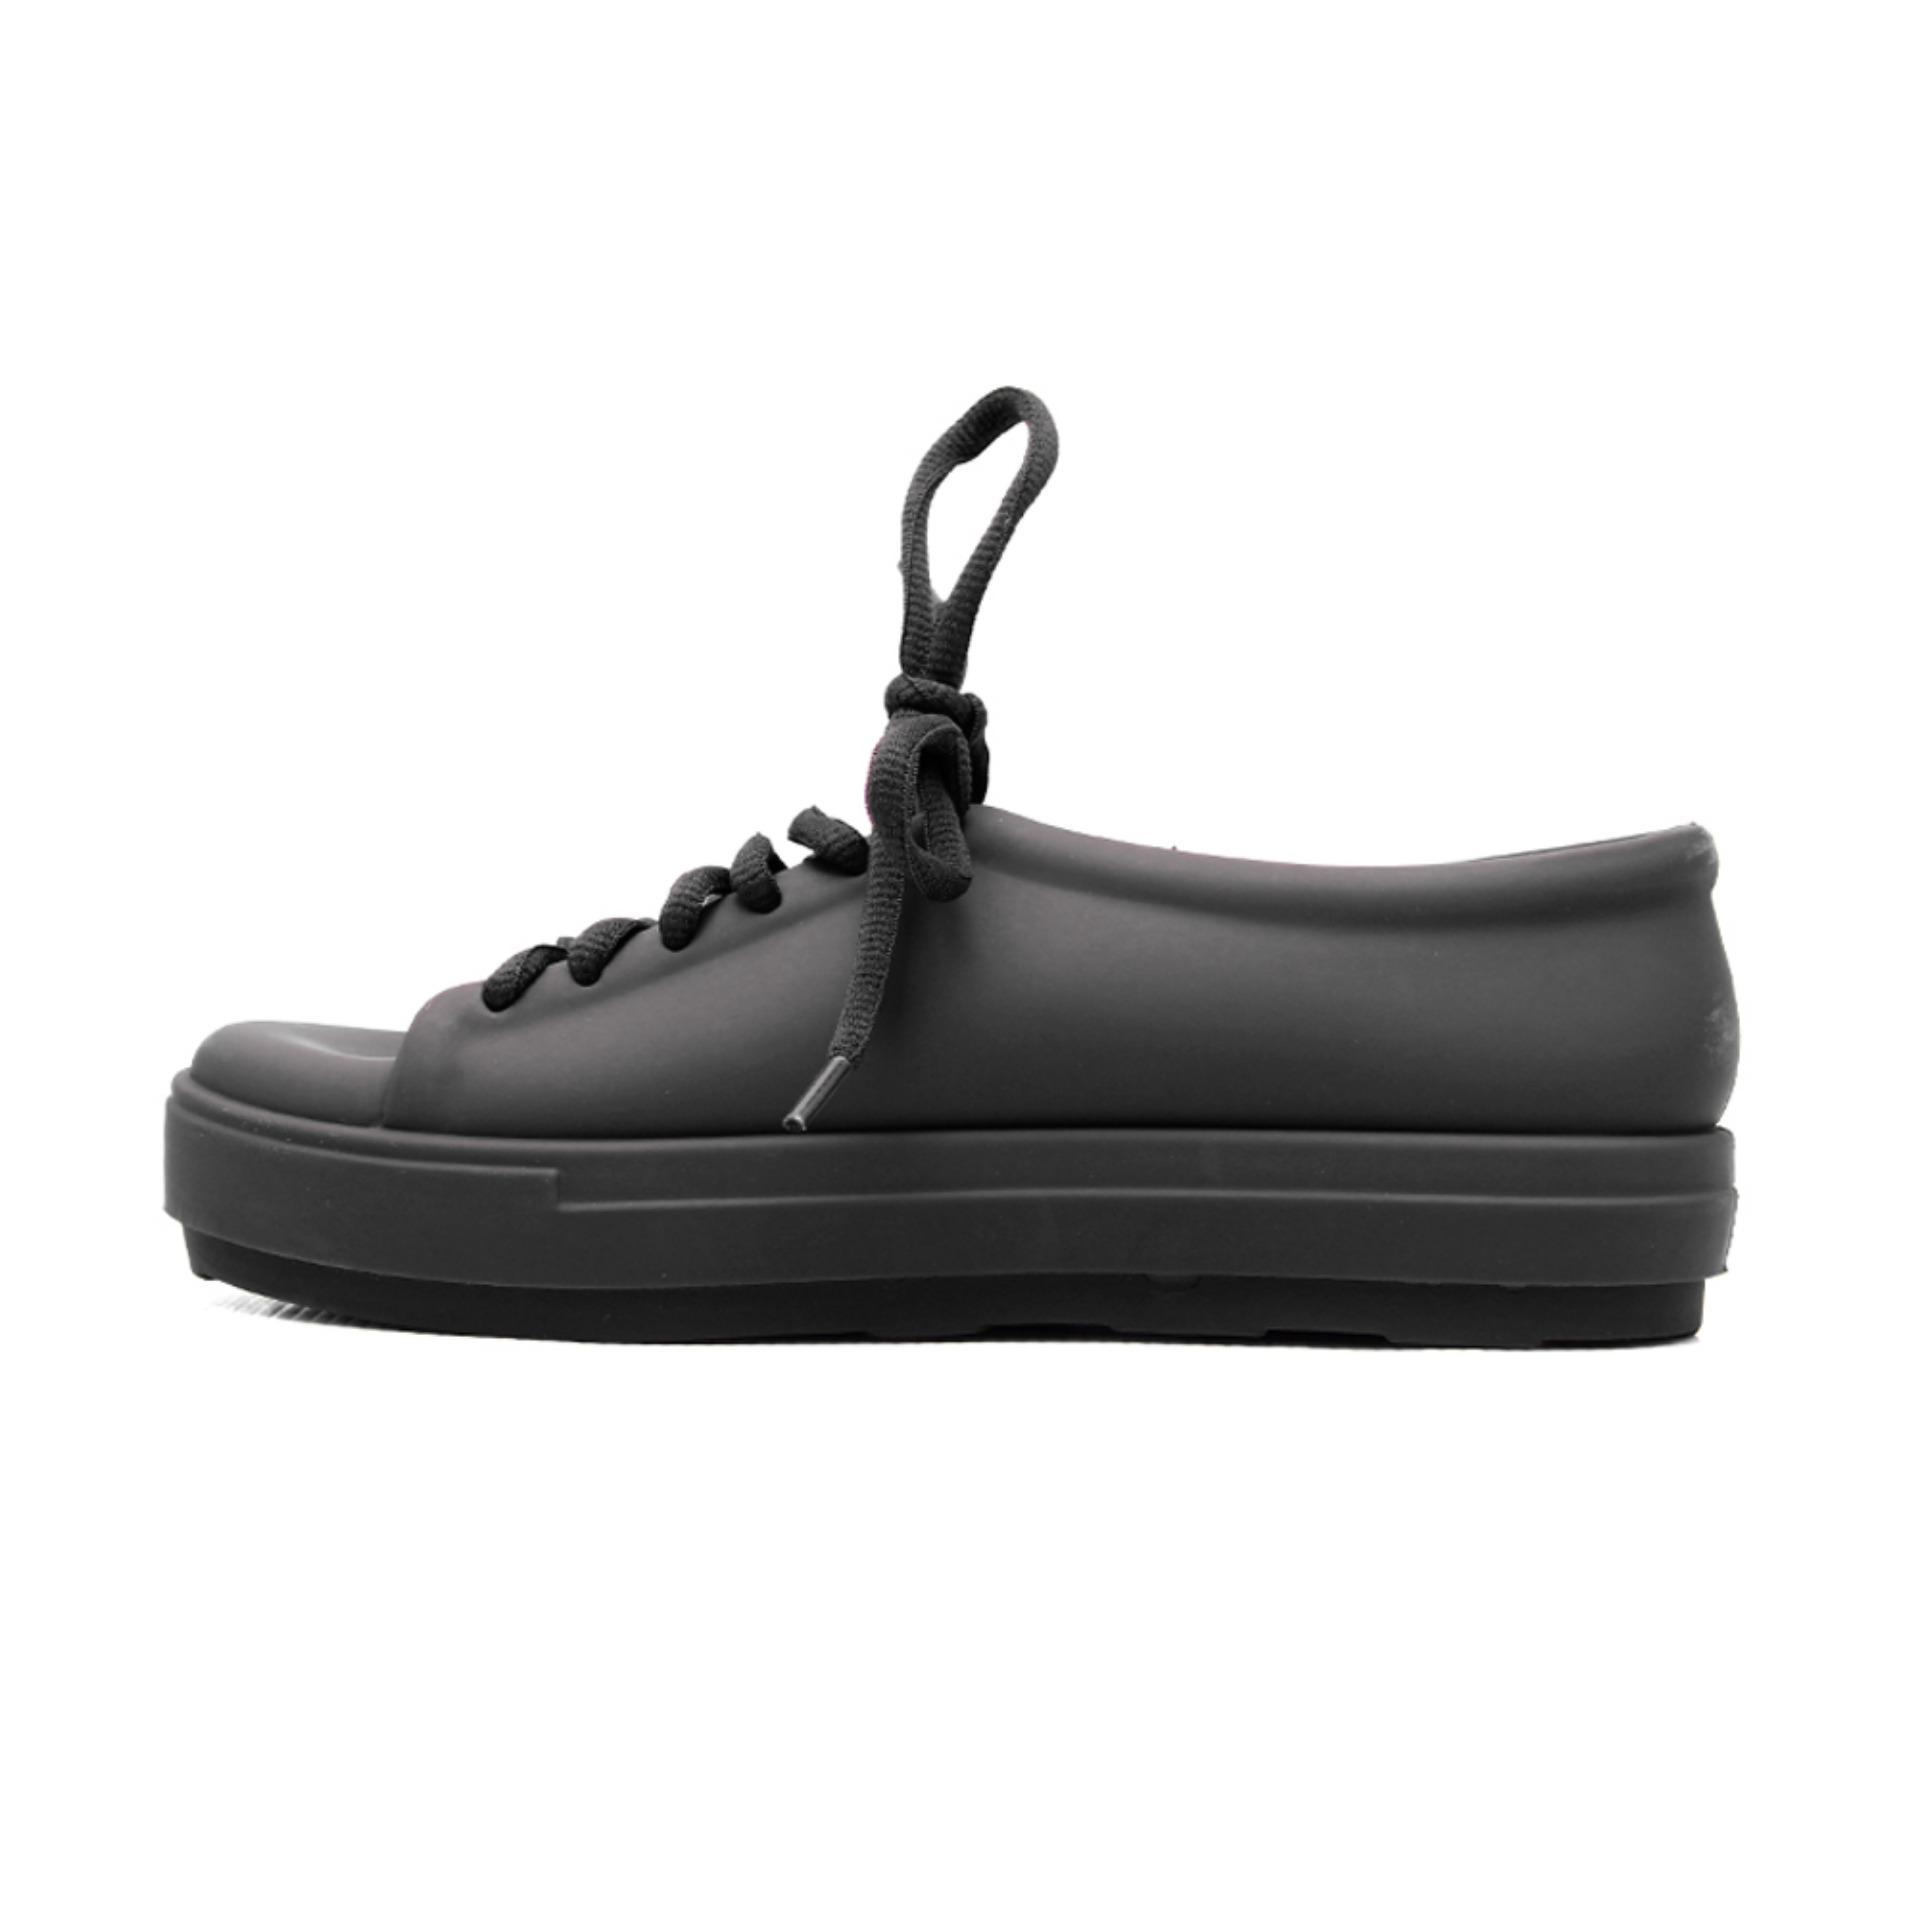 Bara Bara Sepatu Jelly Sneakers Silikon Shoes Cewek Silicone Kets -DD6382ELS - Black .